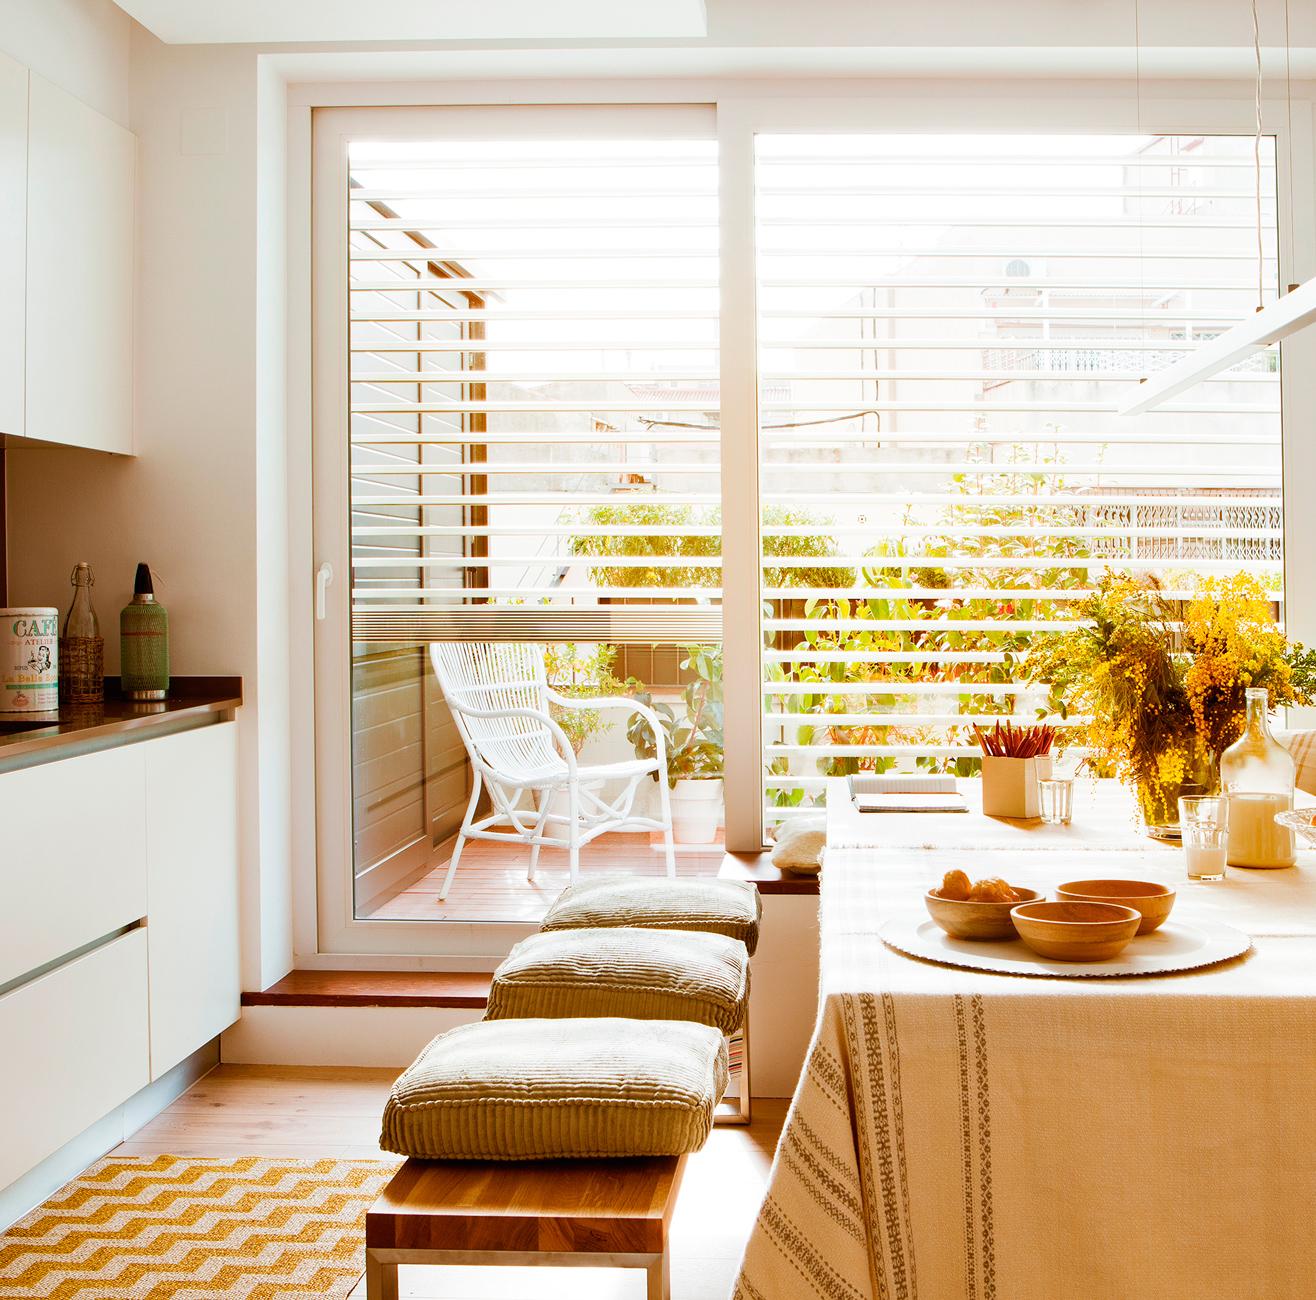 4 interiores conectados con la terraza - Comedor de terraza ...